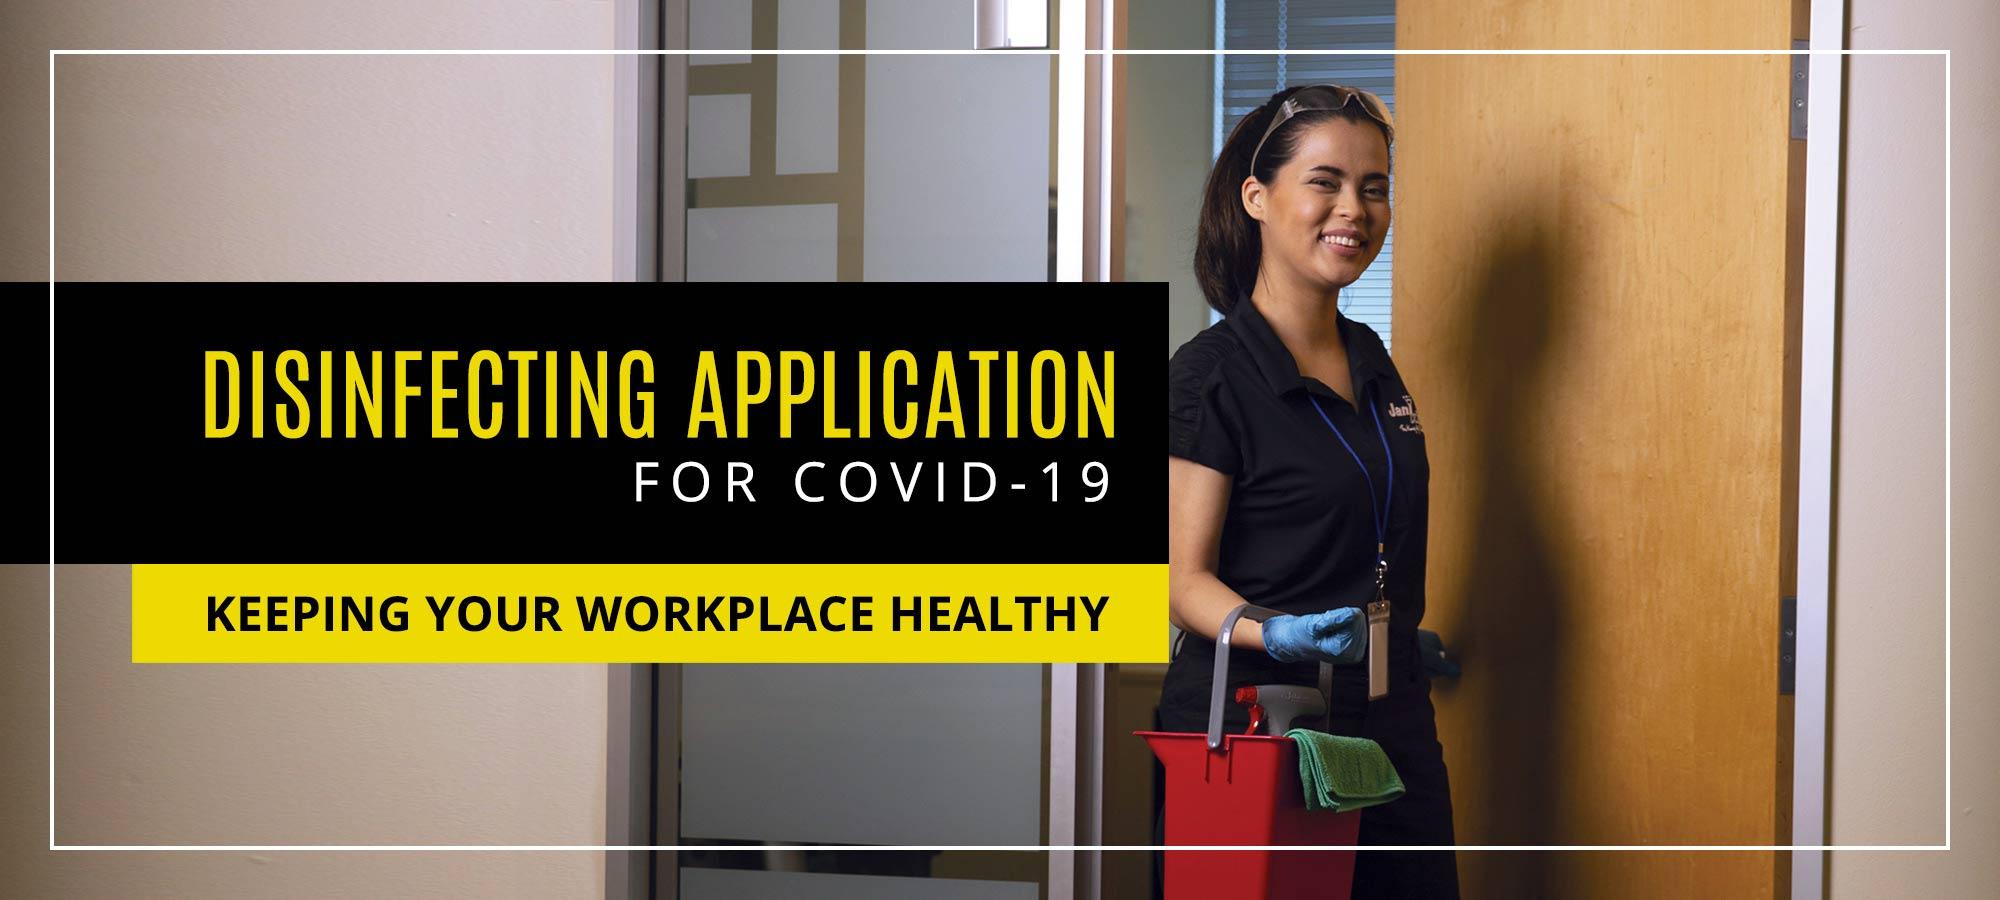 disinfecting services for covid 19 coronavirus